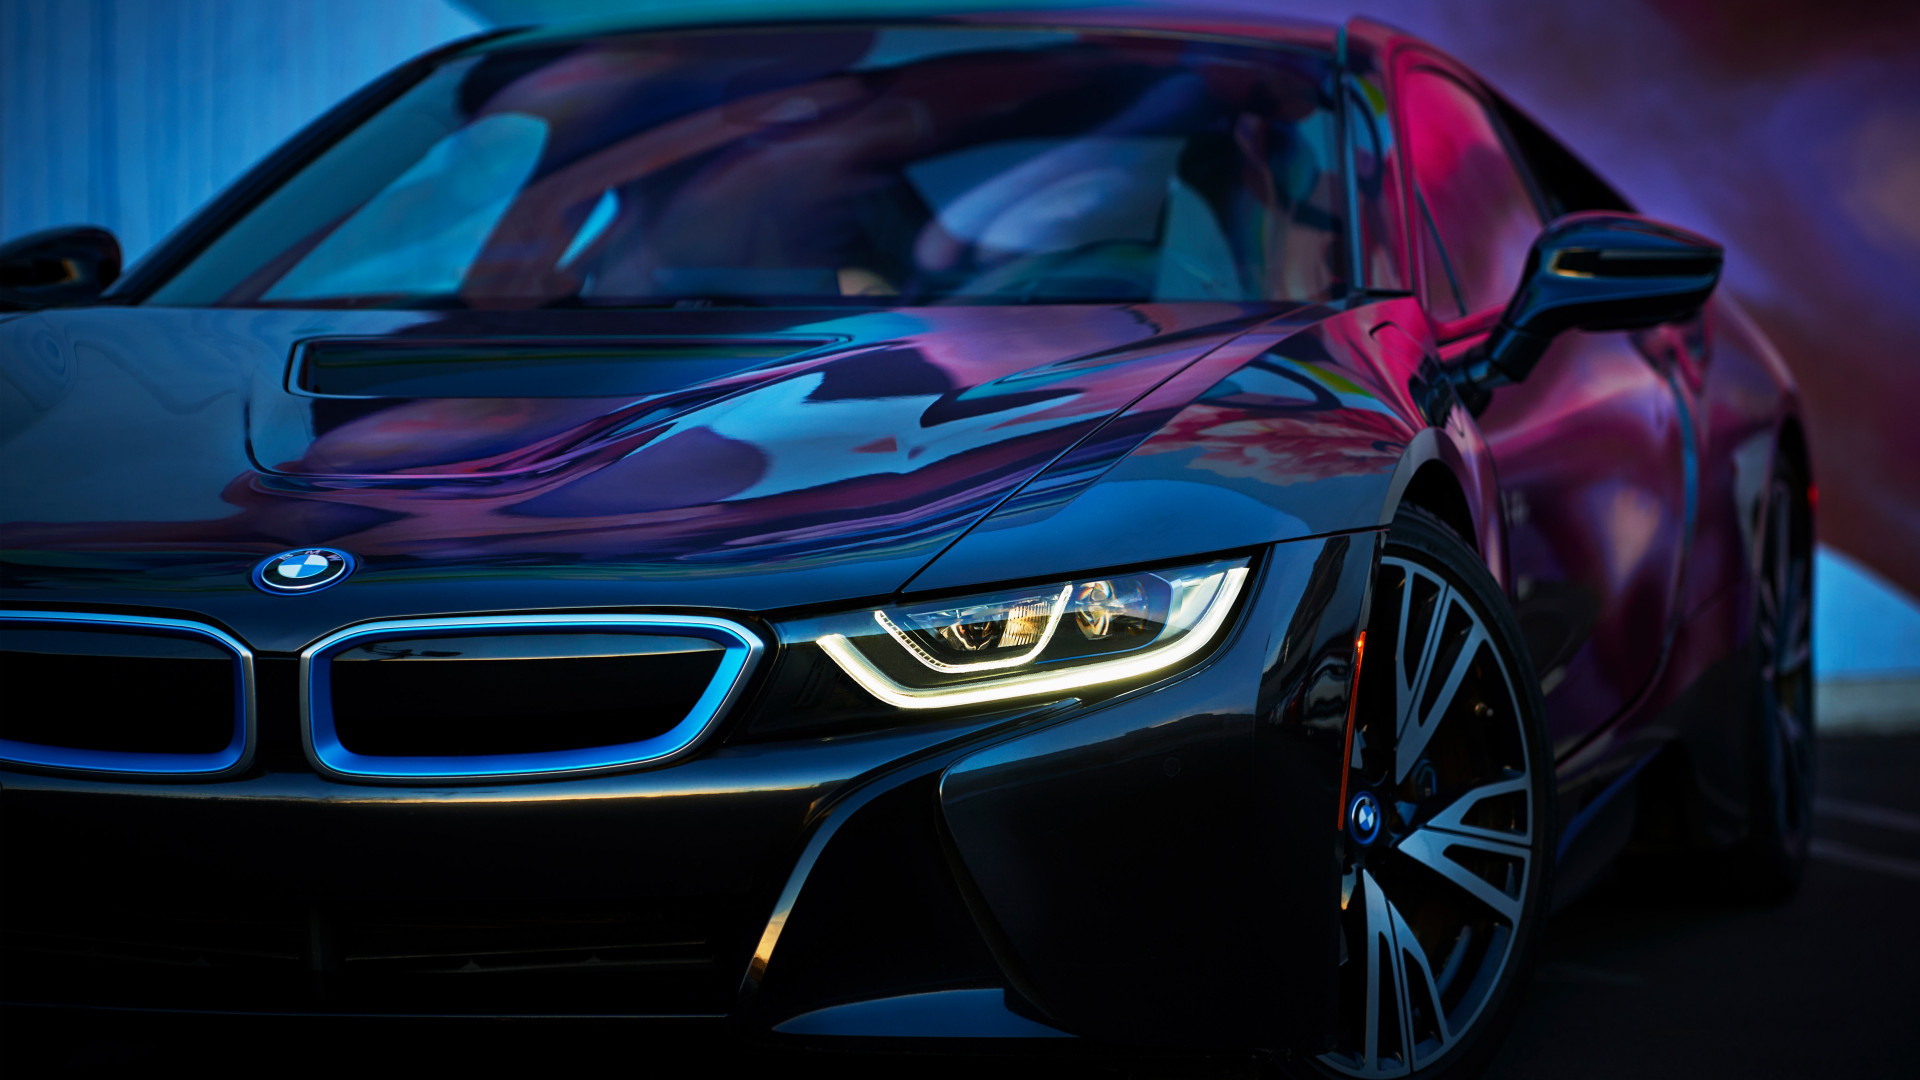 Download wallpaper: BMW i8 1920x1080